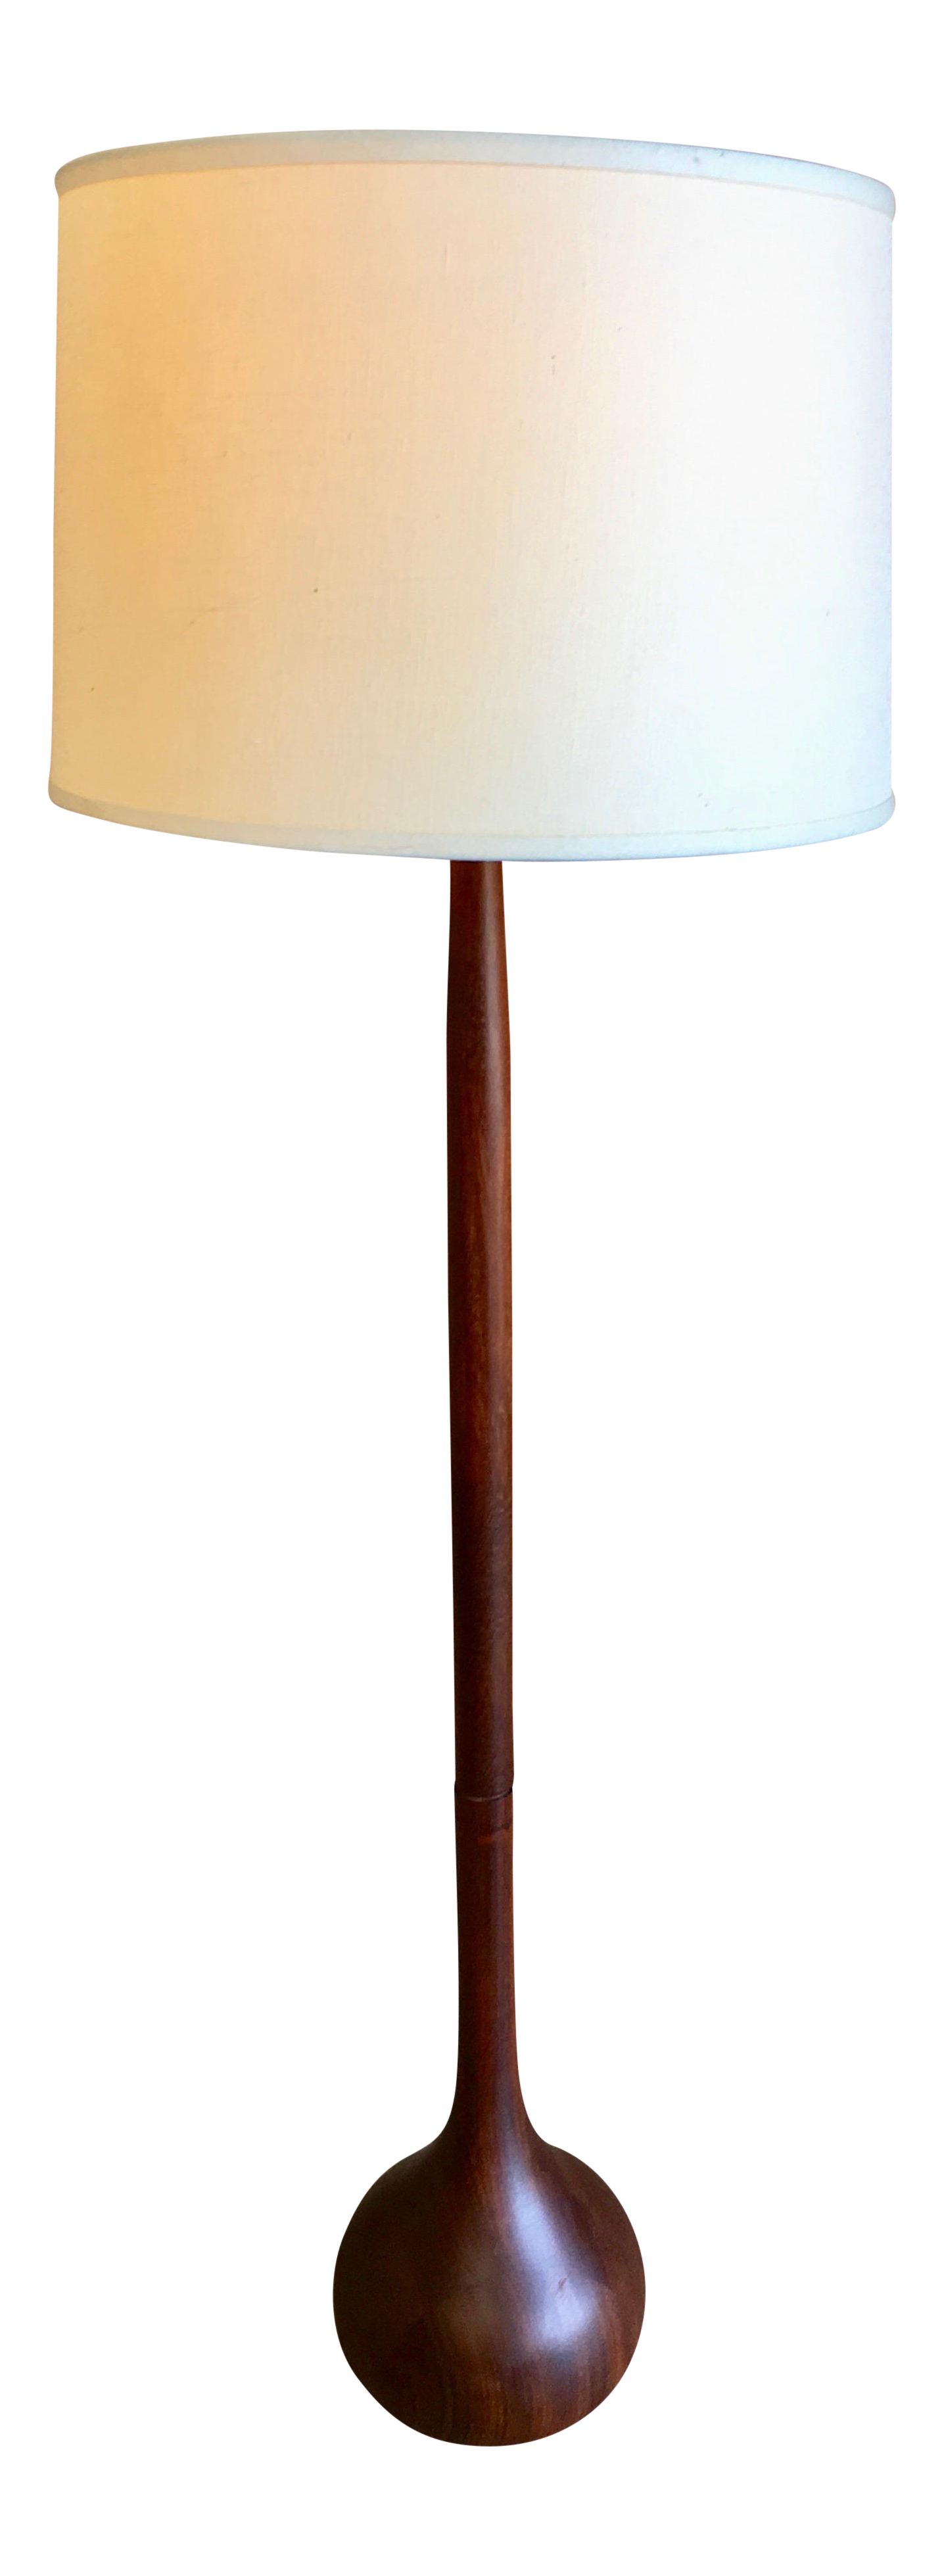 Image of: 1960s Danish Modern Solid Teak Onion Floor Lamp Chairish